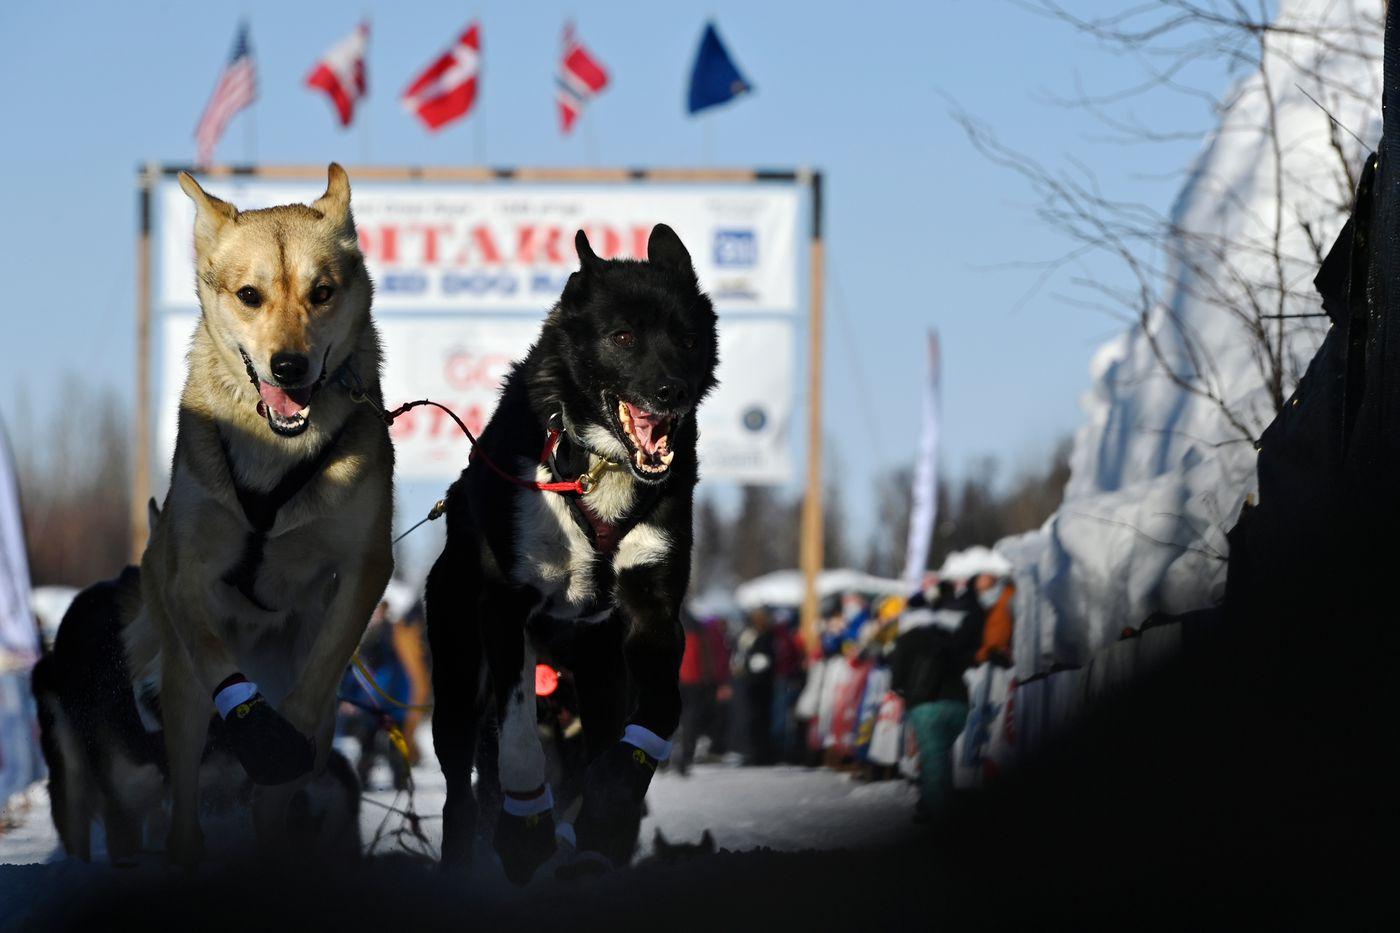 Aaron Burmeister's dogs run from the Iditarod starting area. (Marc Lester / ADN)